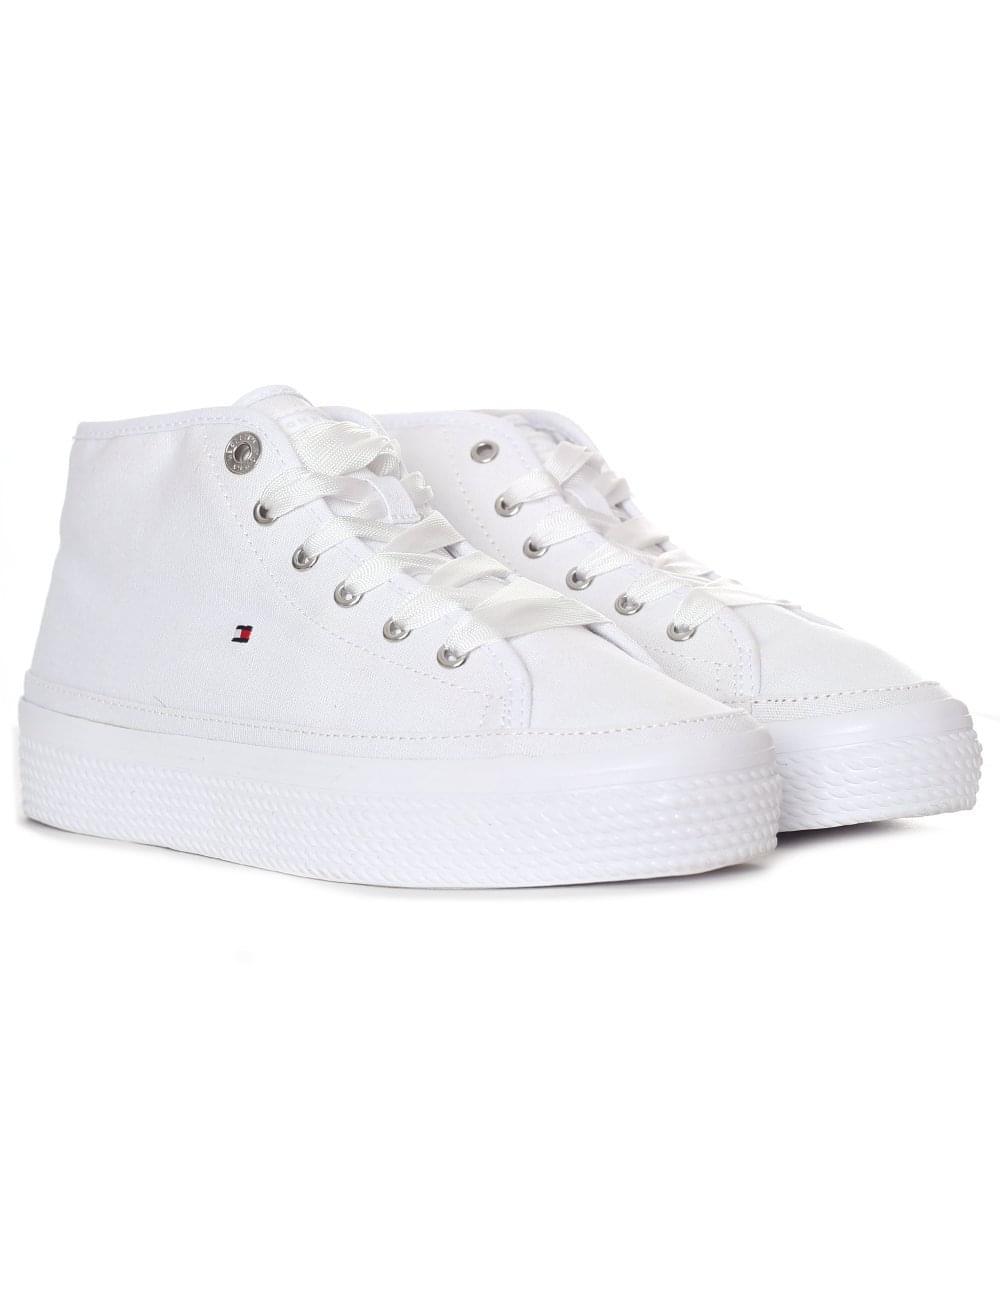 778d2fd7f4ca Tommy Hilfiger Women s Pastel Mid Platform Sneaker